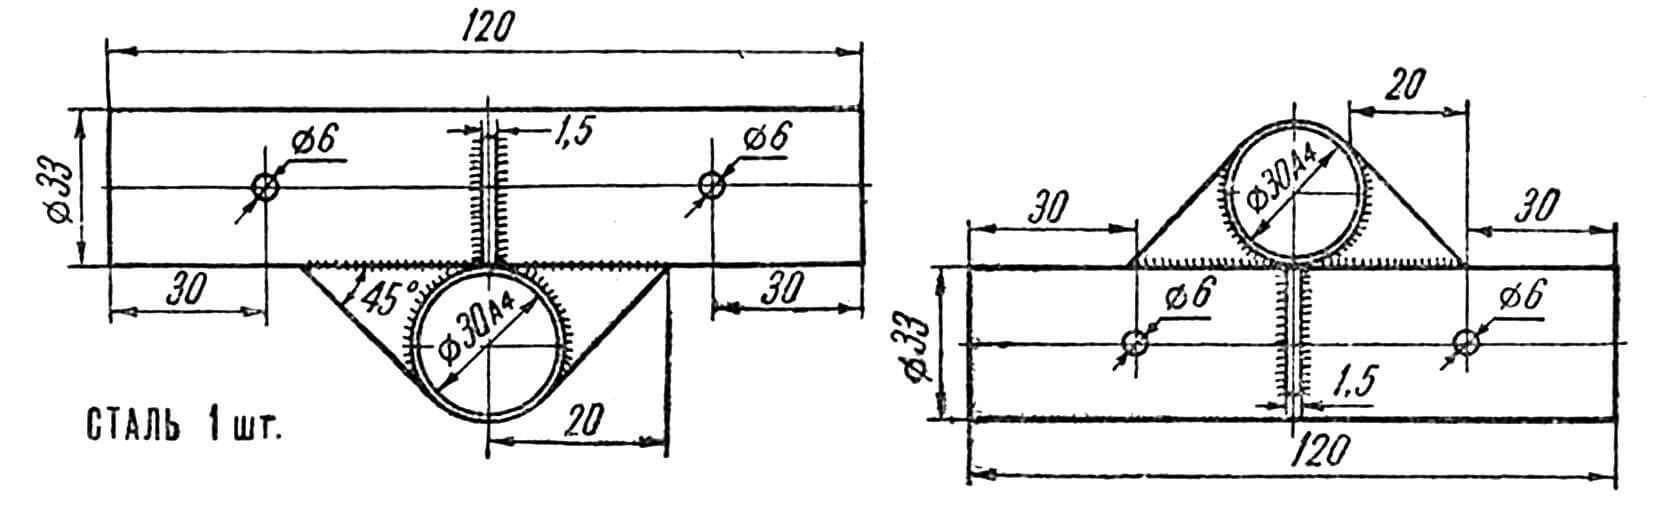 Рис. 4. (Узел Б.)